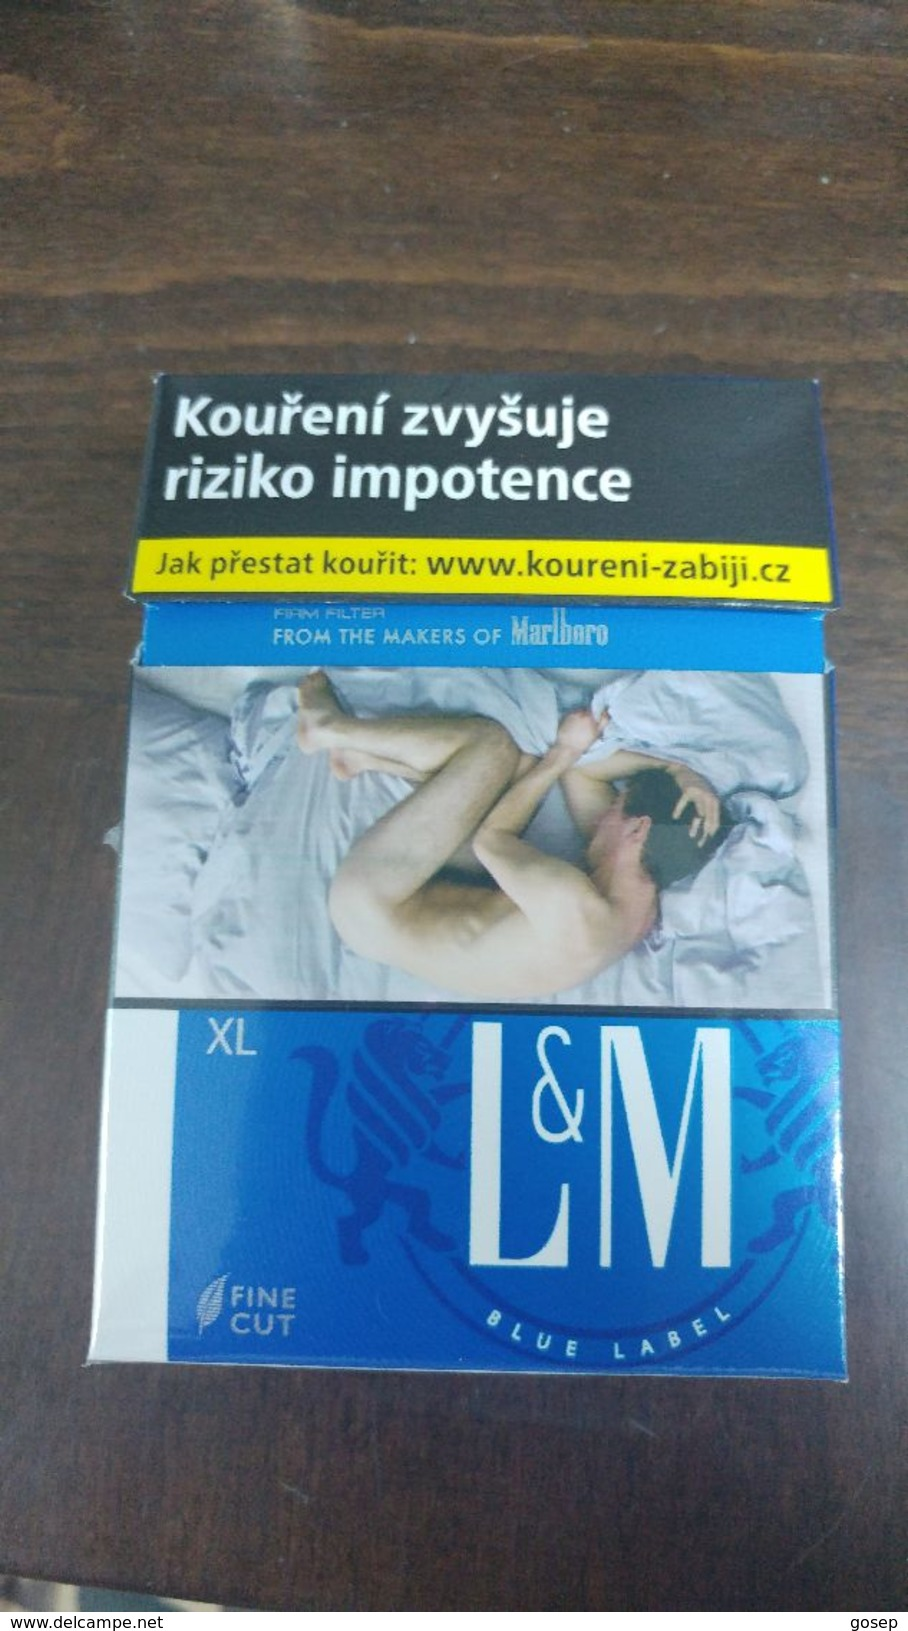 Boxes-ceska Republika-box Empty Cigarette - Empty Cigarettes Boxes